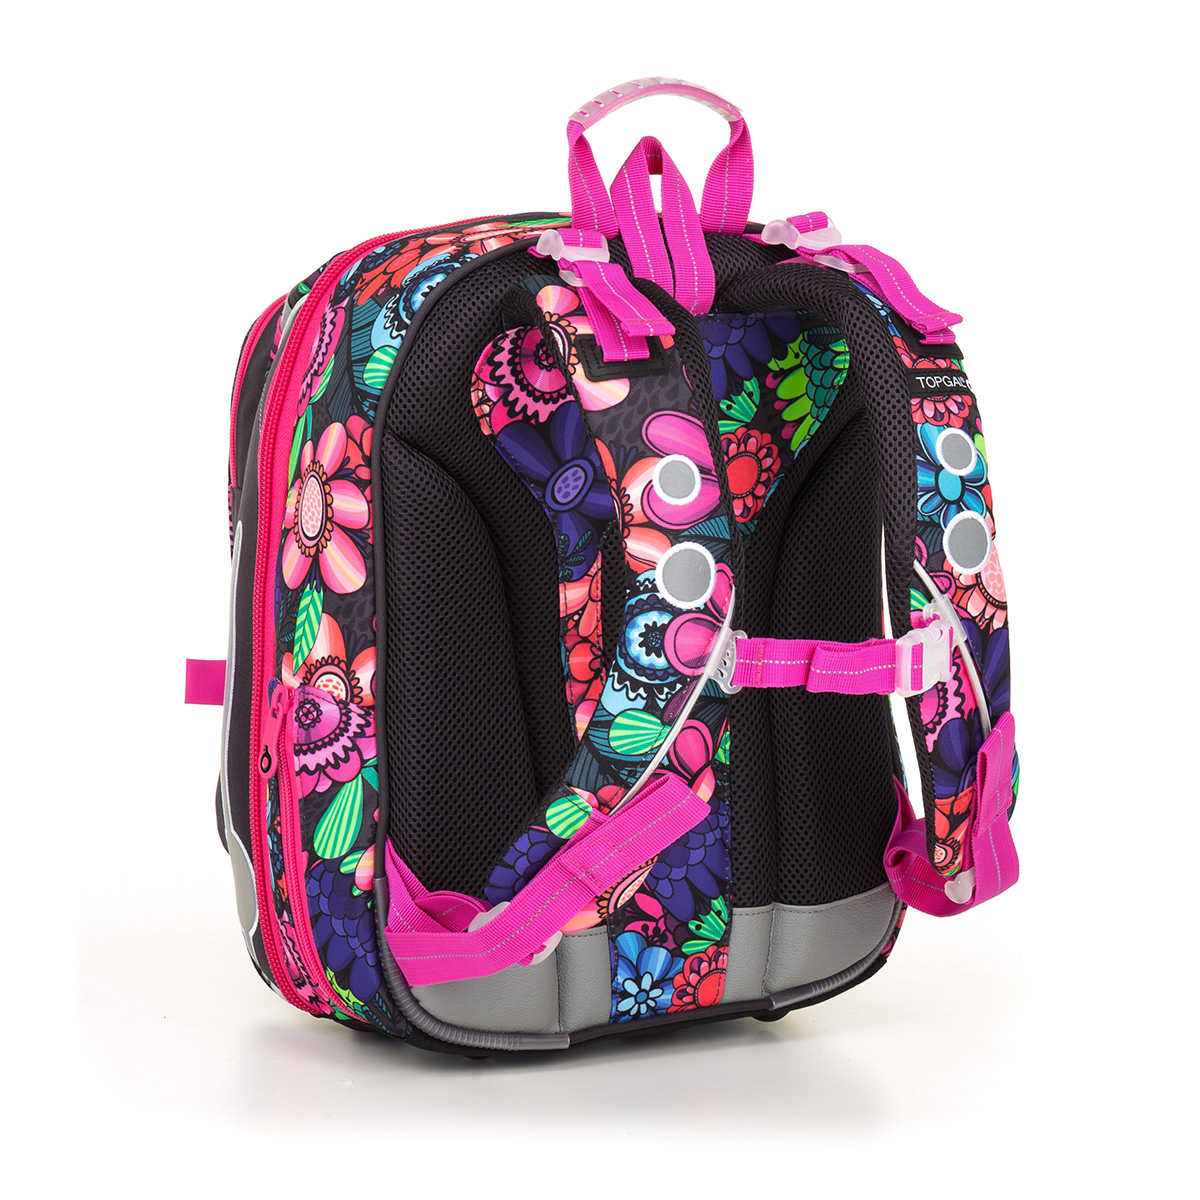 ... TOPGAL Školní batoh BEBE 18008 + ZDARMA krabička na svačinu abd527c752